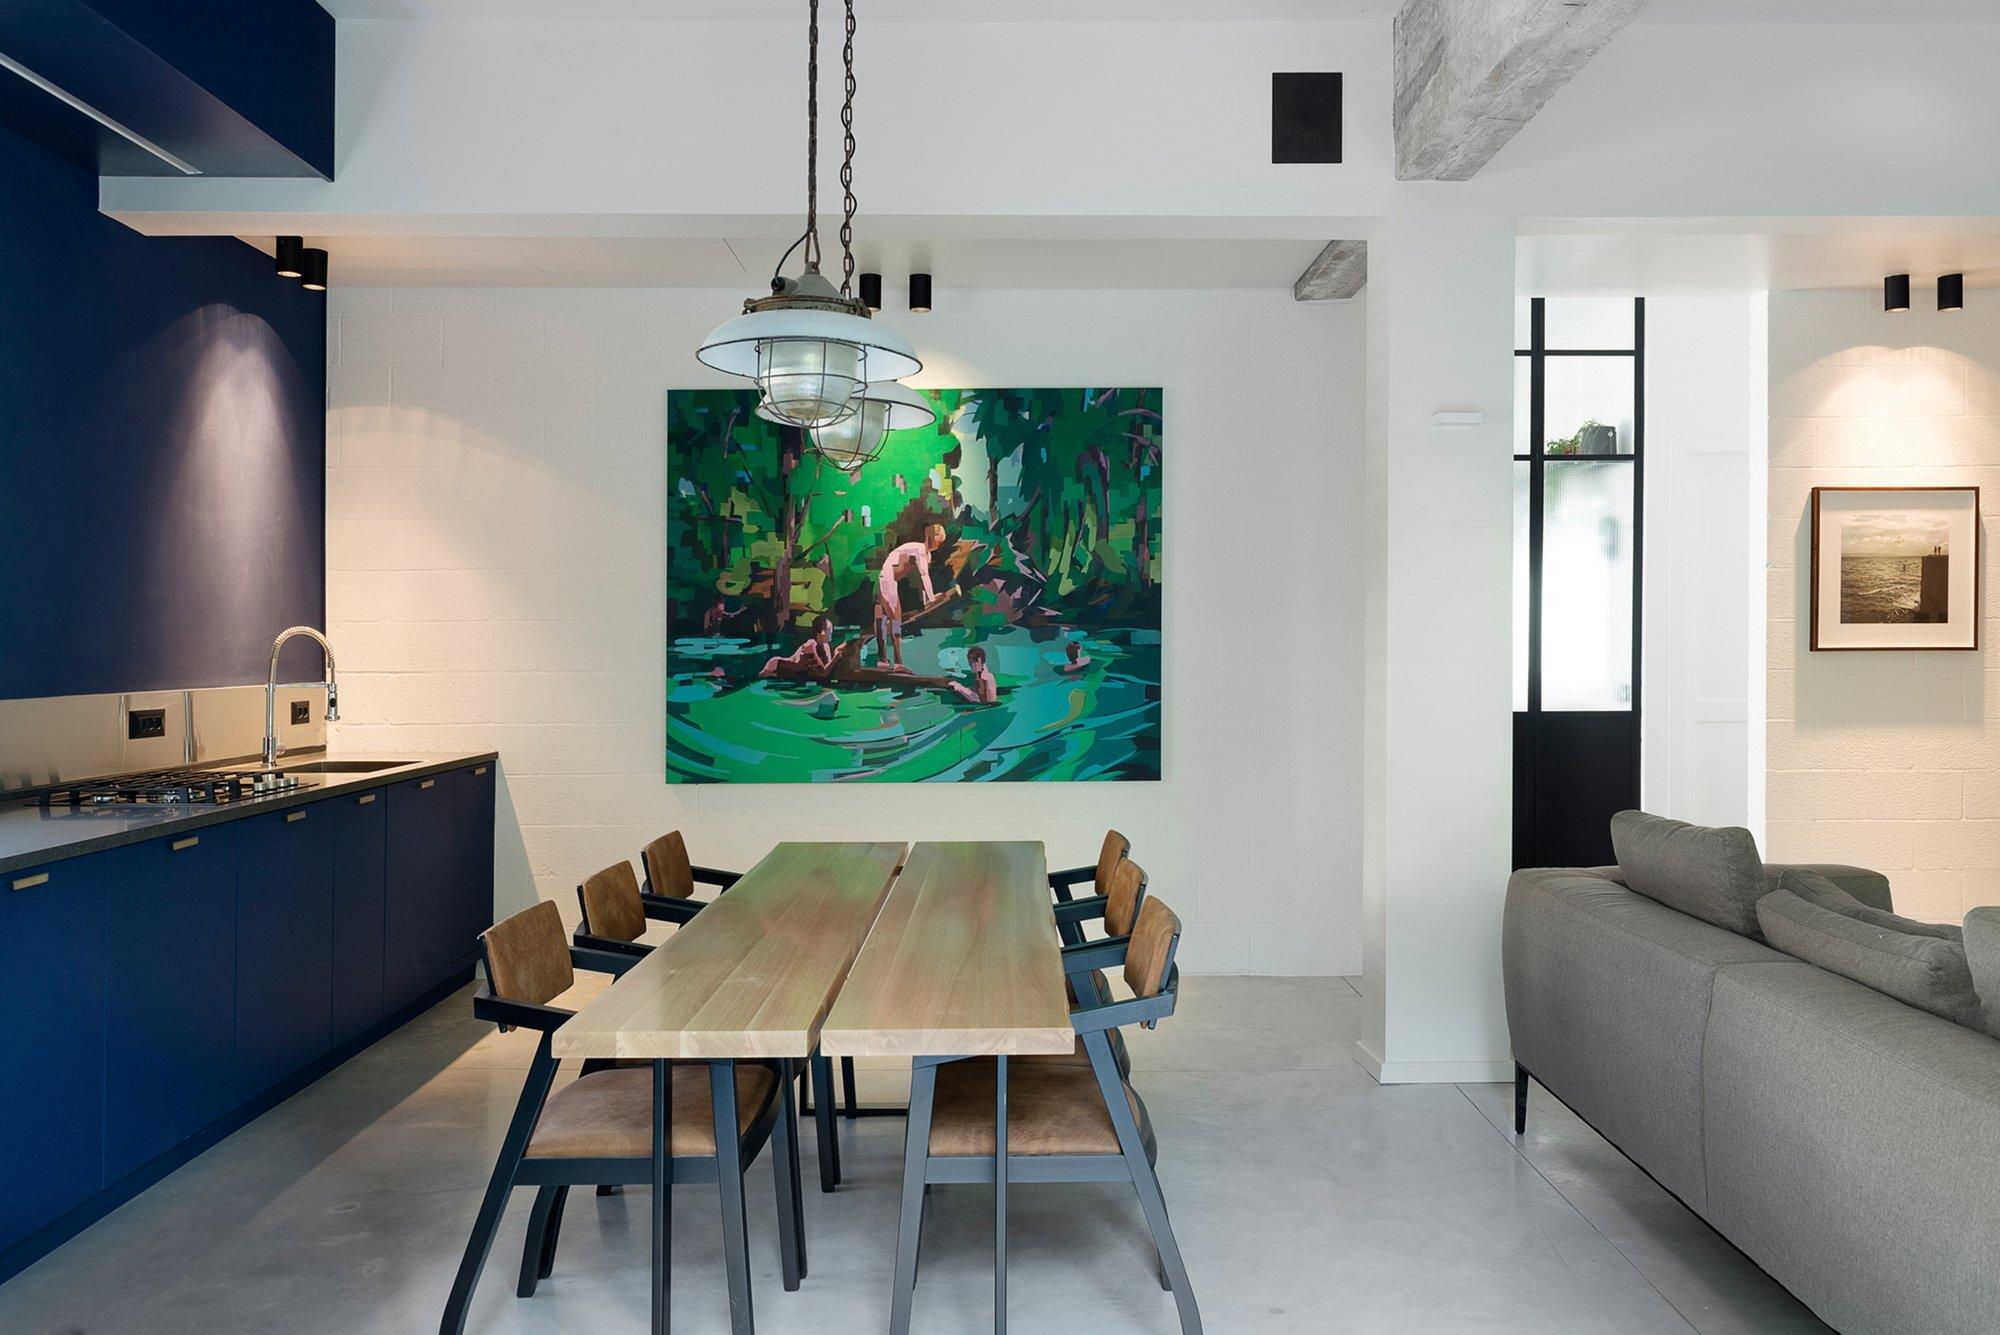 Bauhaus Apartment Redesign - Small Apartment - Studio Raanan Stern Architect - Tel Aviv - Kitchen - Humble Homes